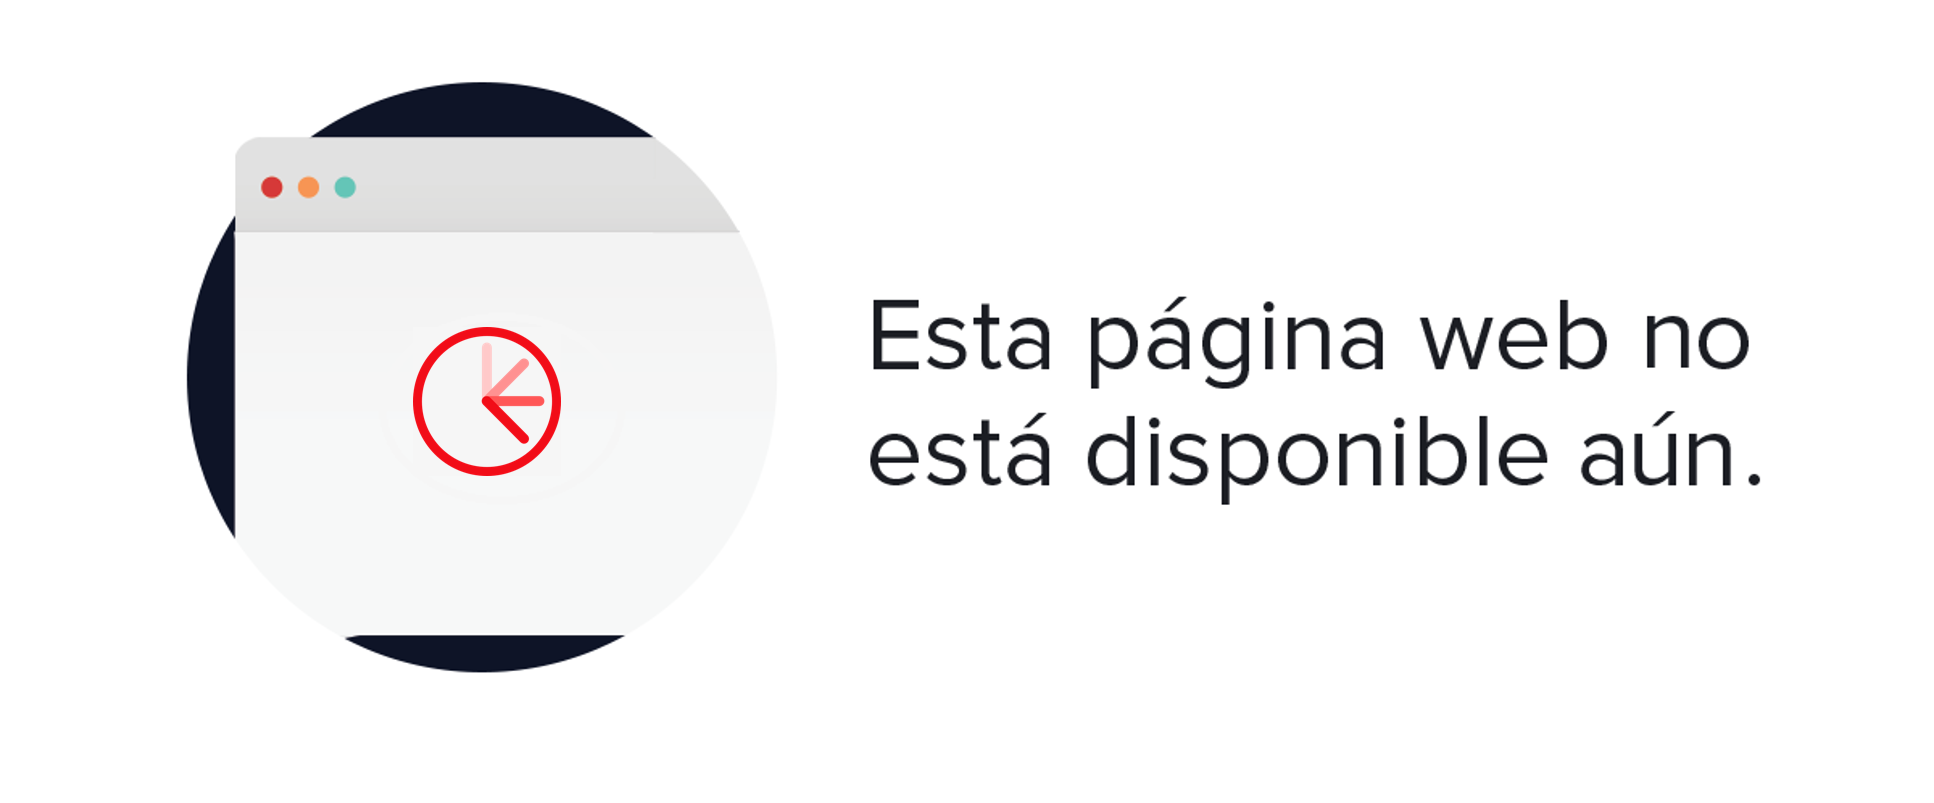 Adidas - Ask SPR Mujer tanque de formación naranja FBEADB13000 CXZHHYZ